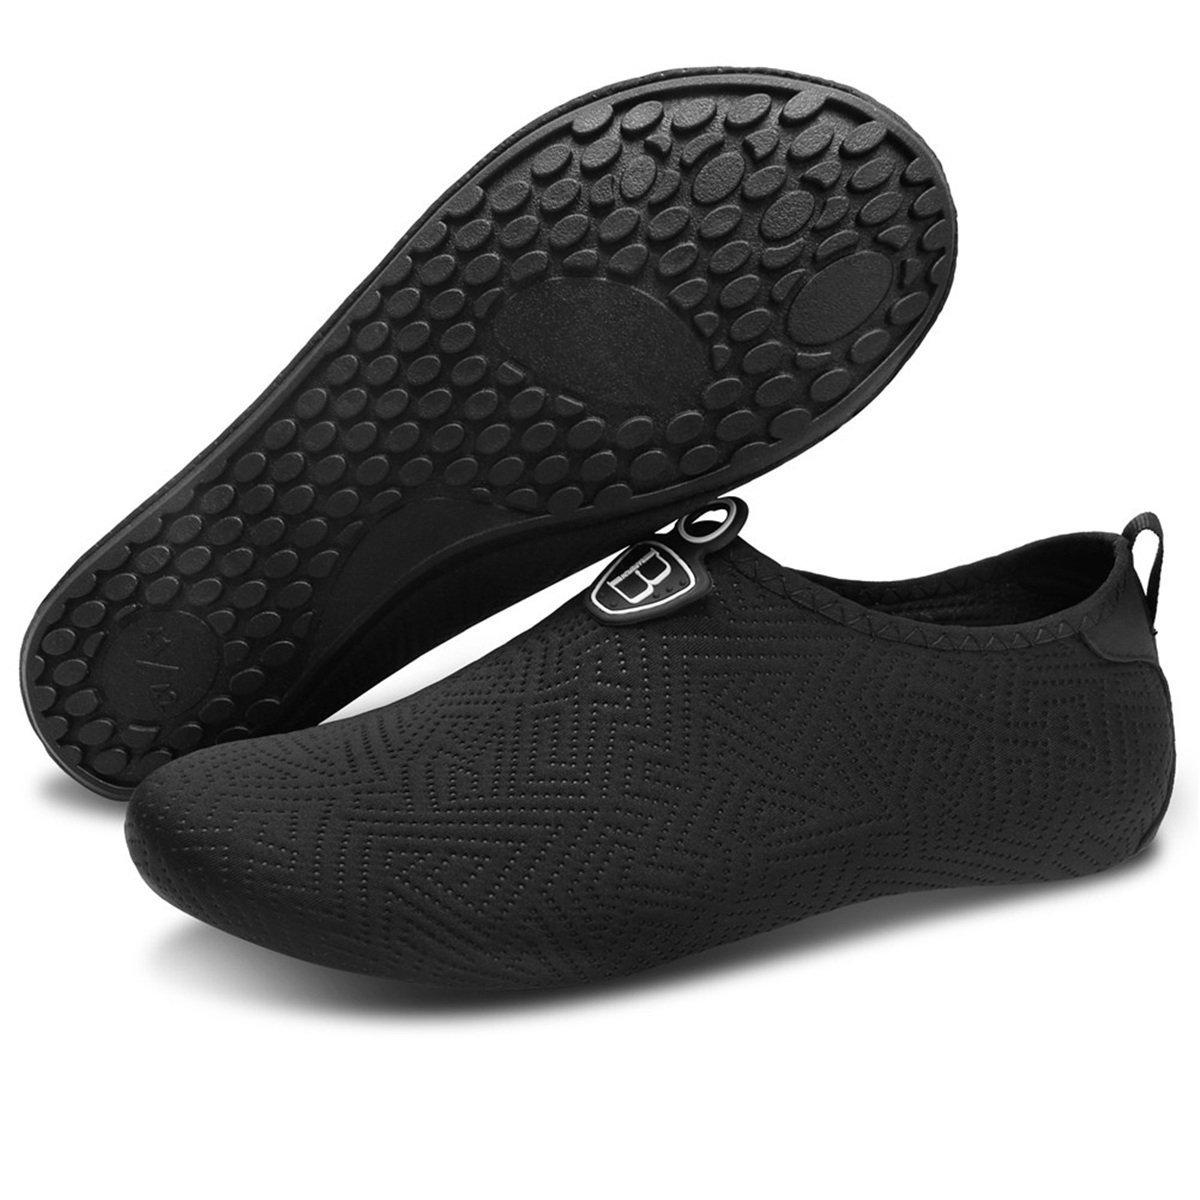 Barerun Barefoot Quick-Dry Water Sports Shoes Aqua Socks for Swim Beach Pool Surf Yoga for Women Men 10-11 US Men … by Barerun